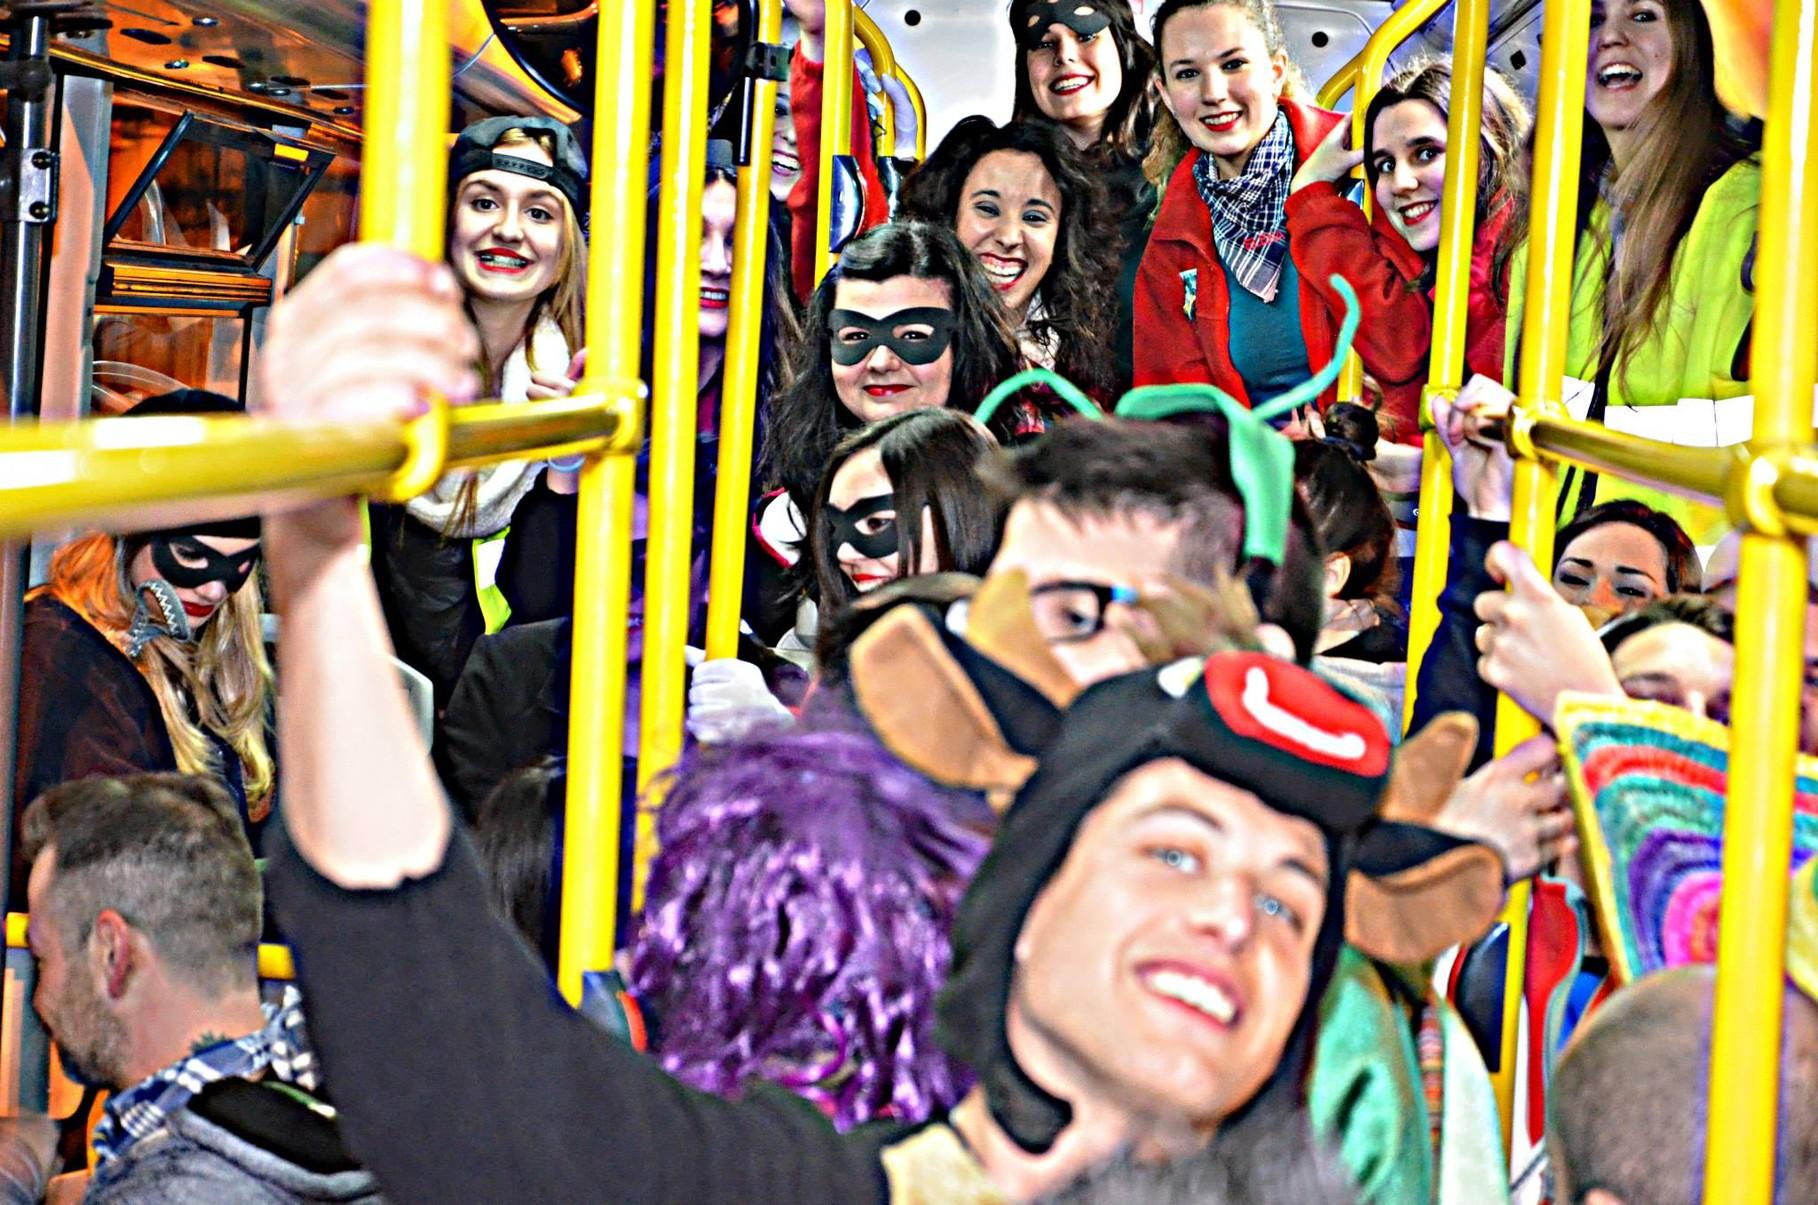 14-03-2014. Bus turístic.